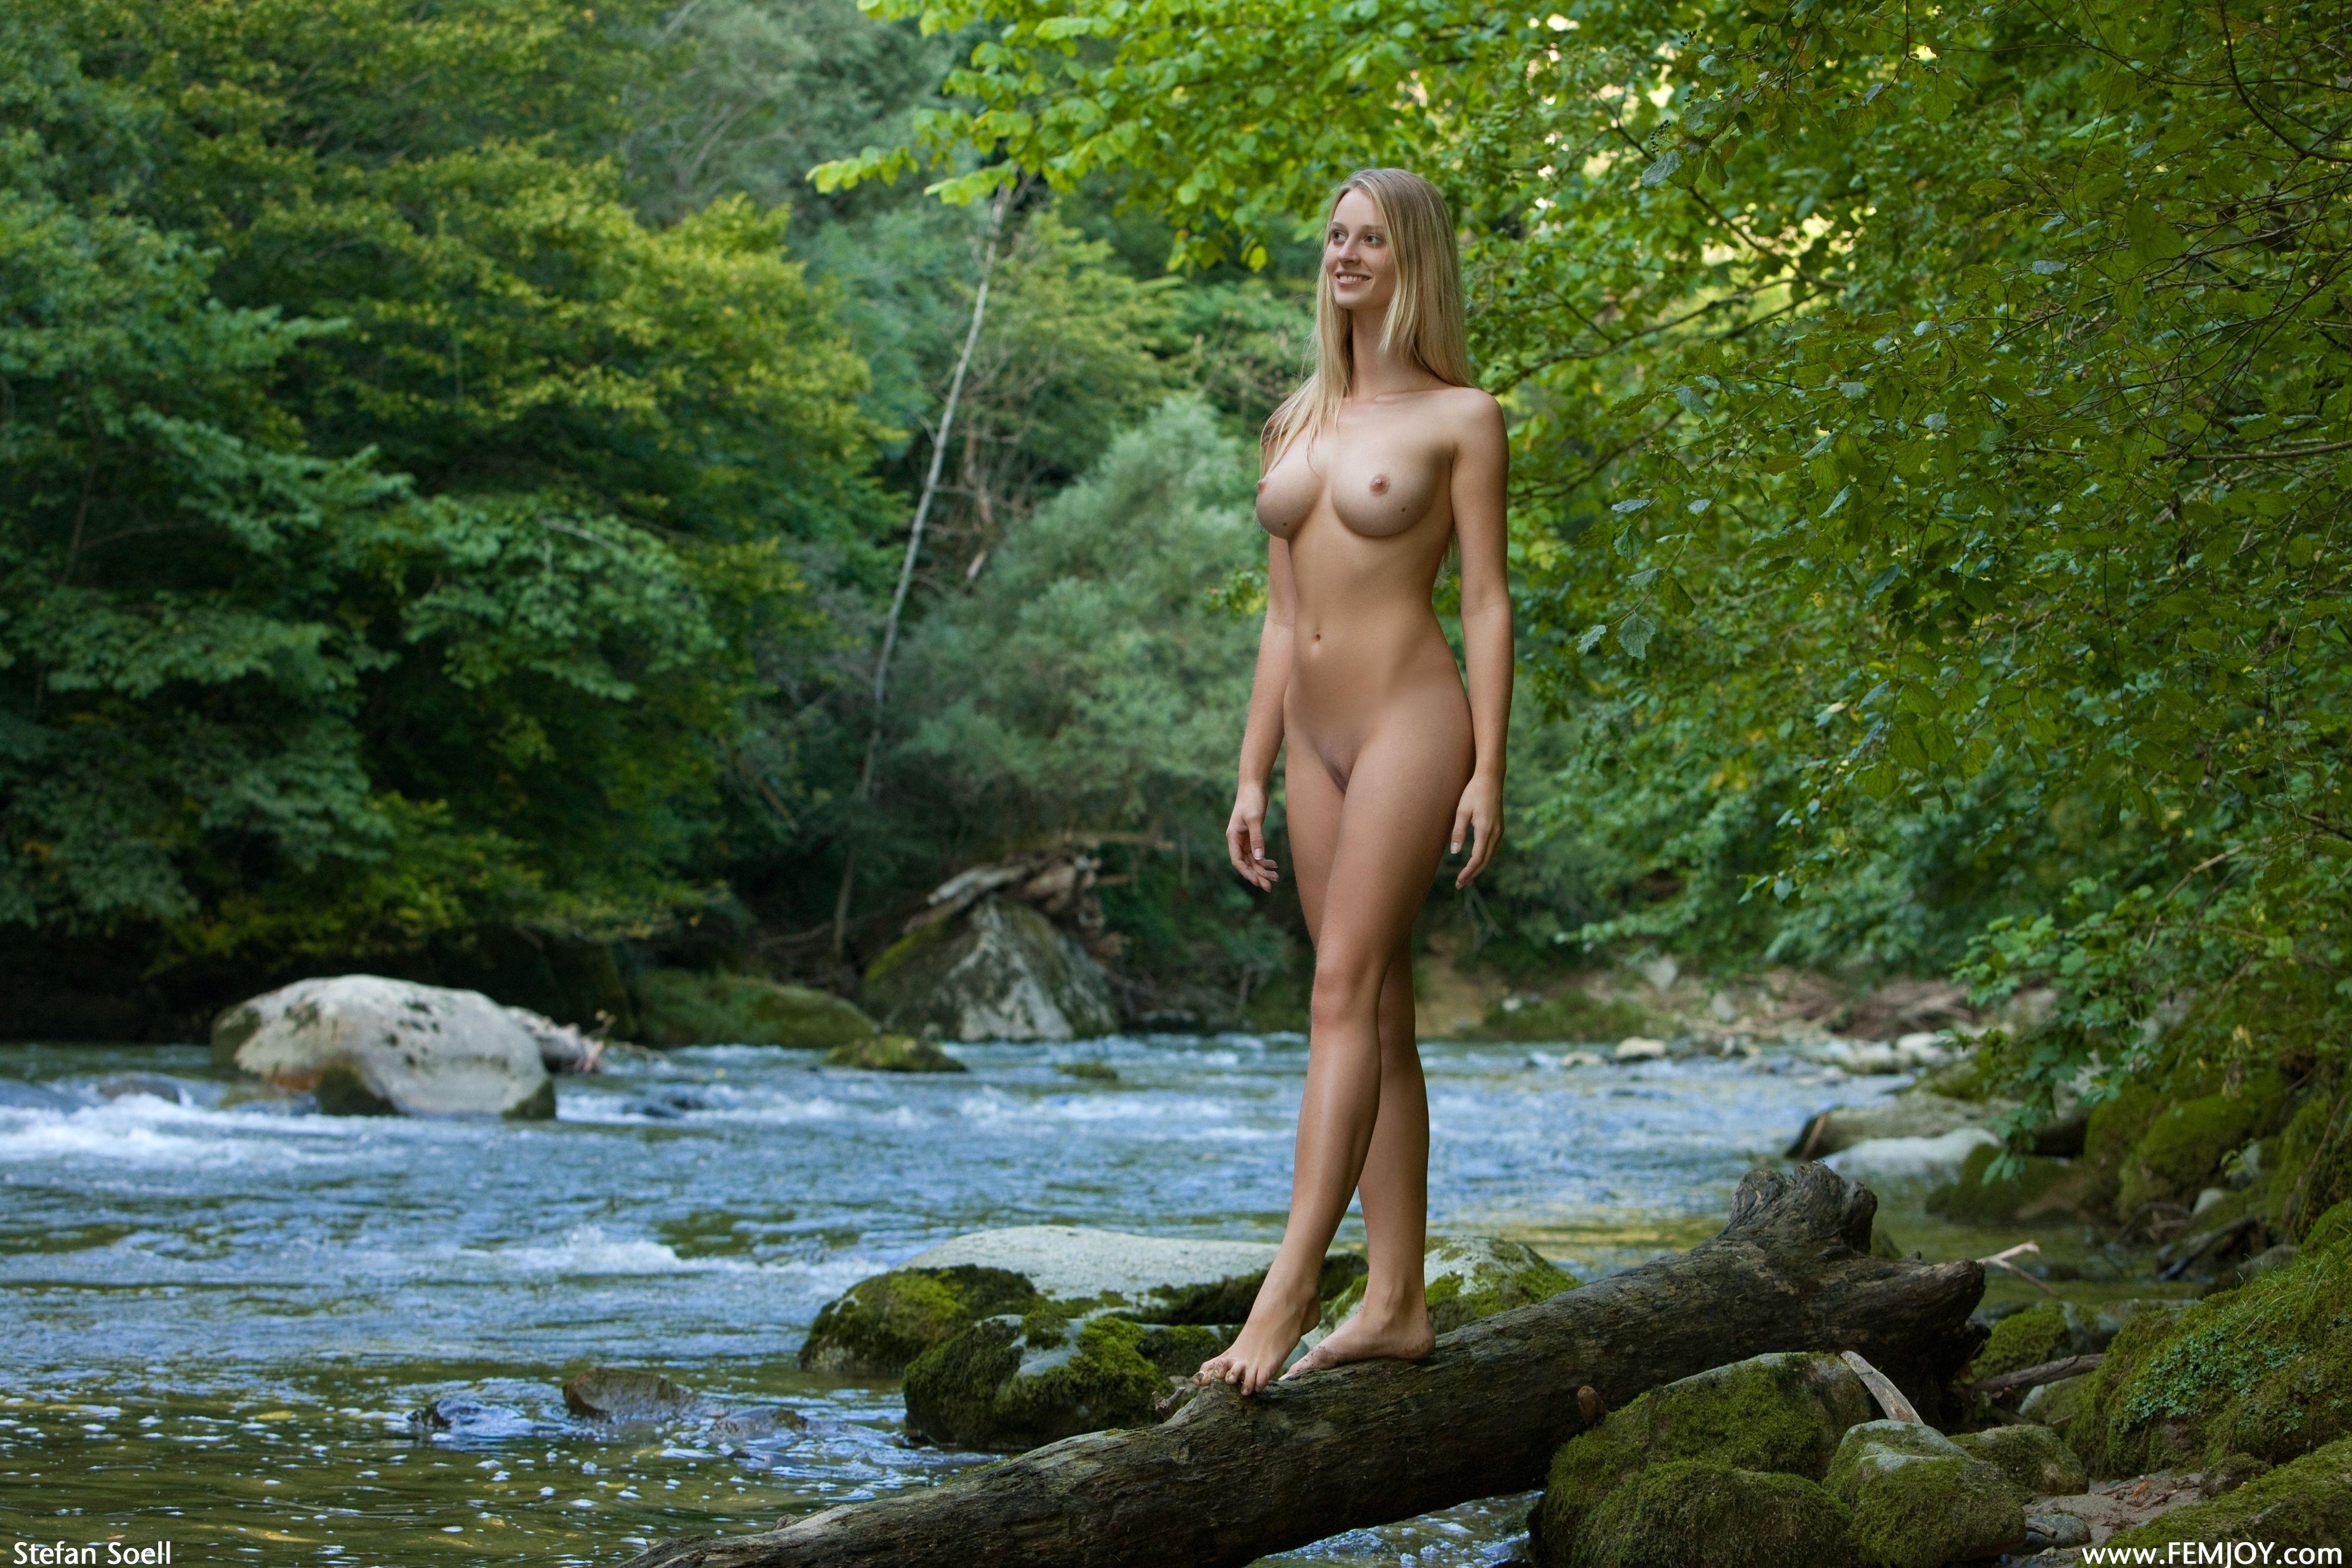 Wallpaper Carisha, Blonde, Sexy Girl, Nude, Naked, Legs -2280